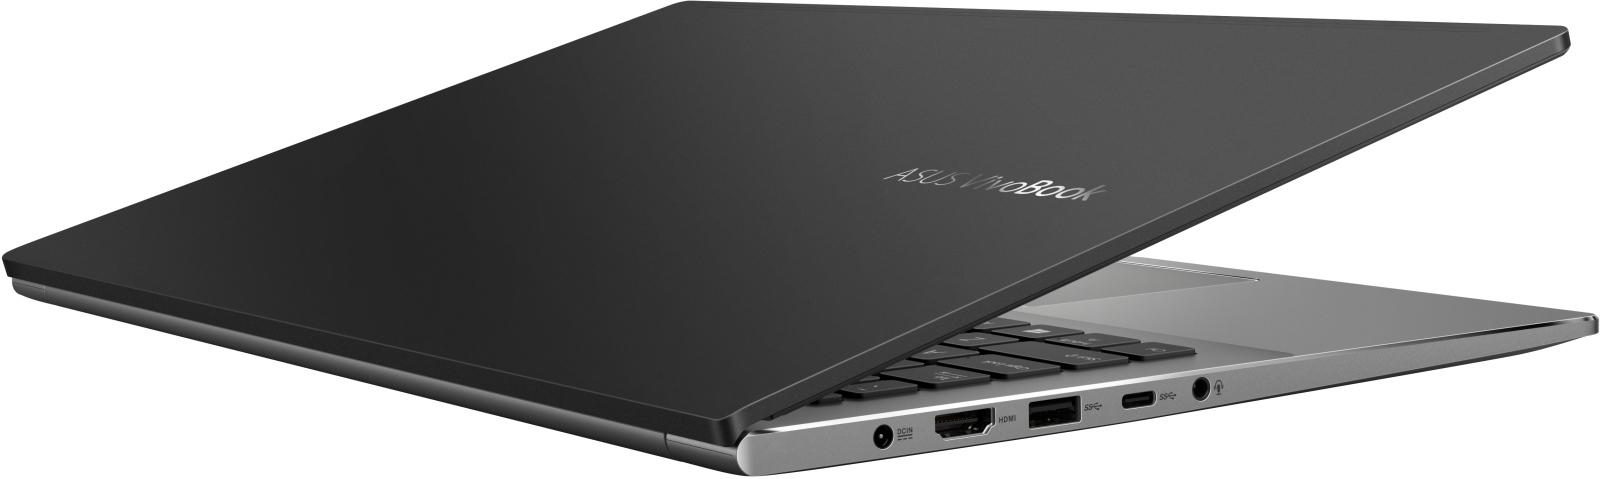 "15.6"" ASUS VivoBook S15 Laptop image"